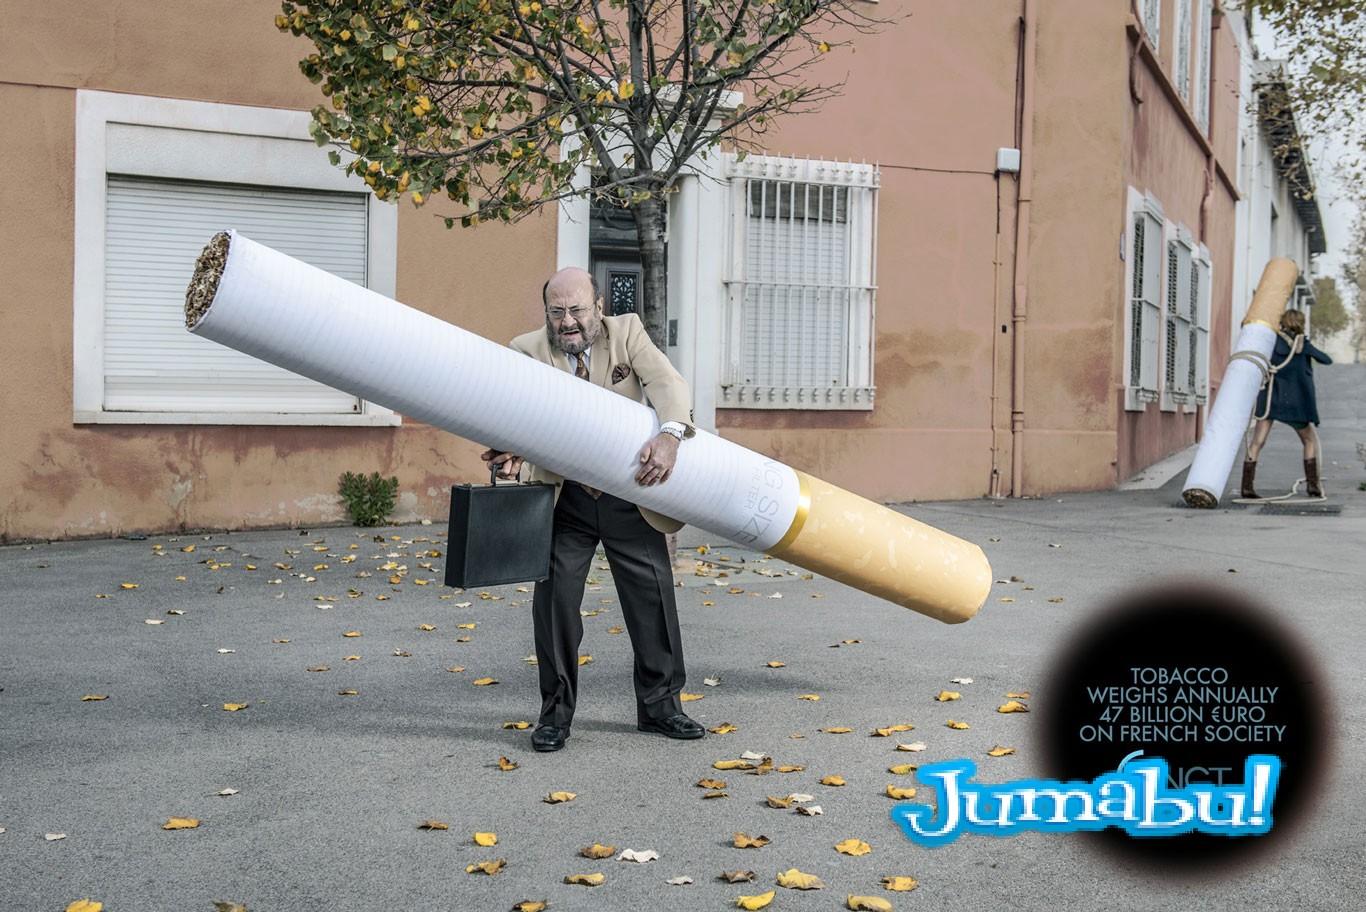 cnct-cigarros-gigantes-2